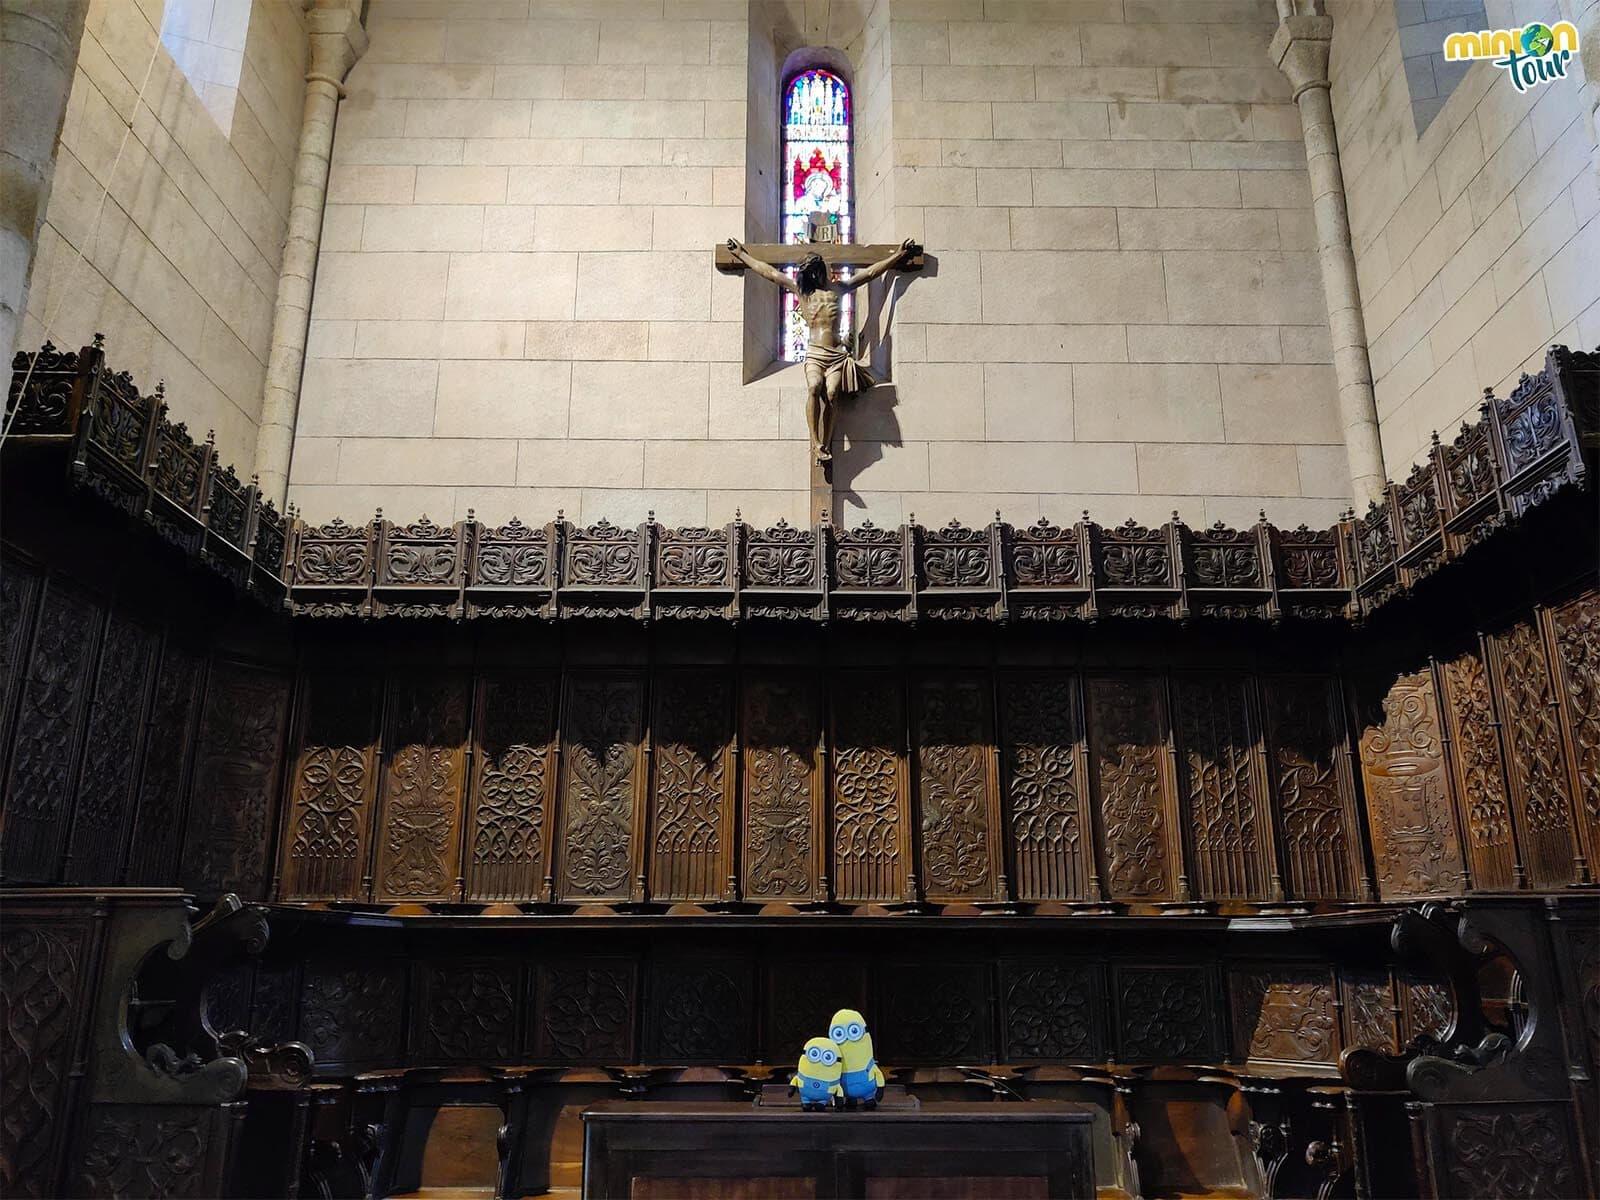 Minions en el coro de la Catedral de Mondoñedo